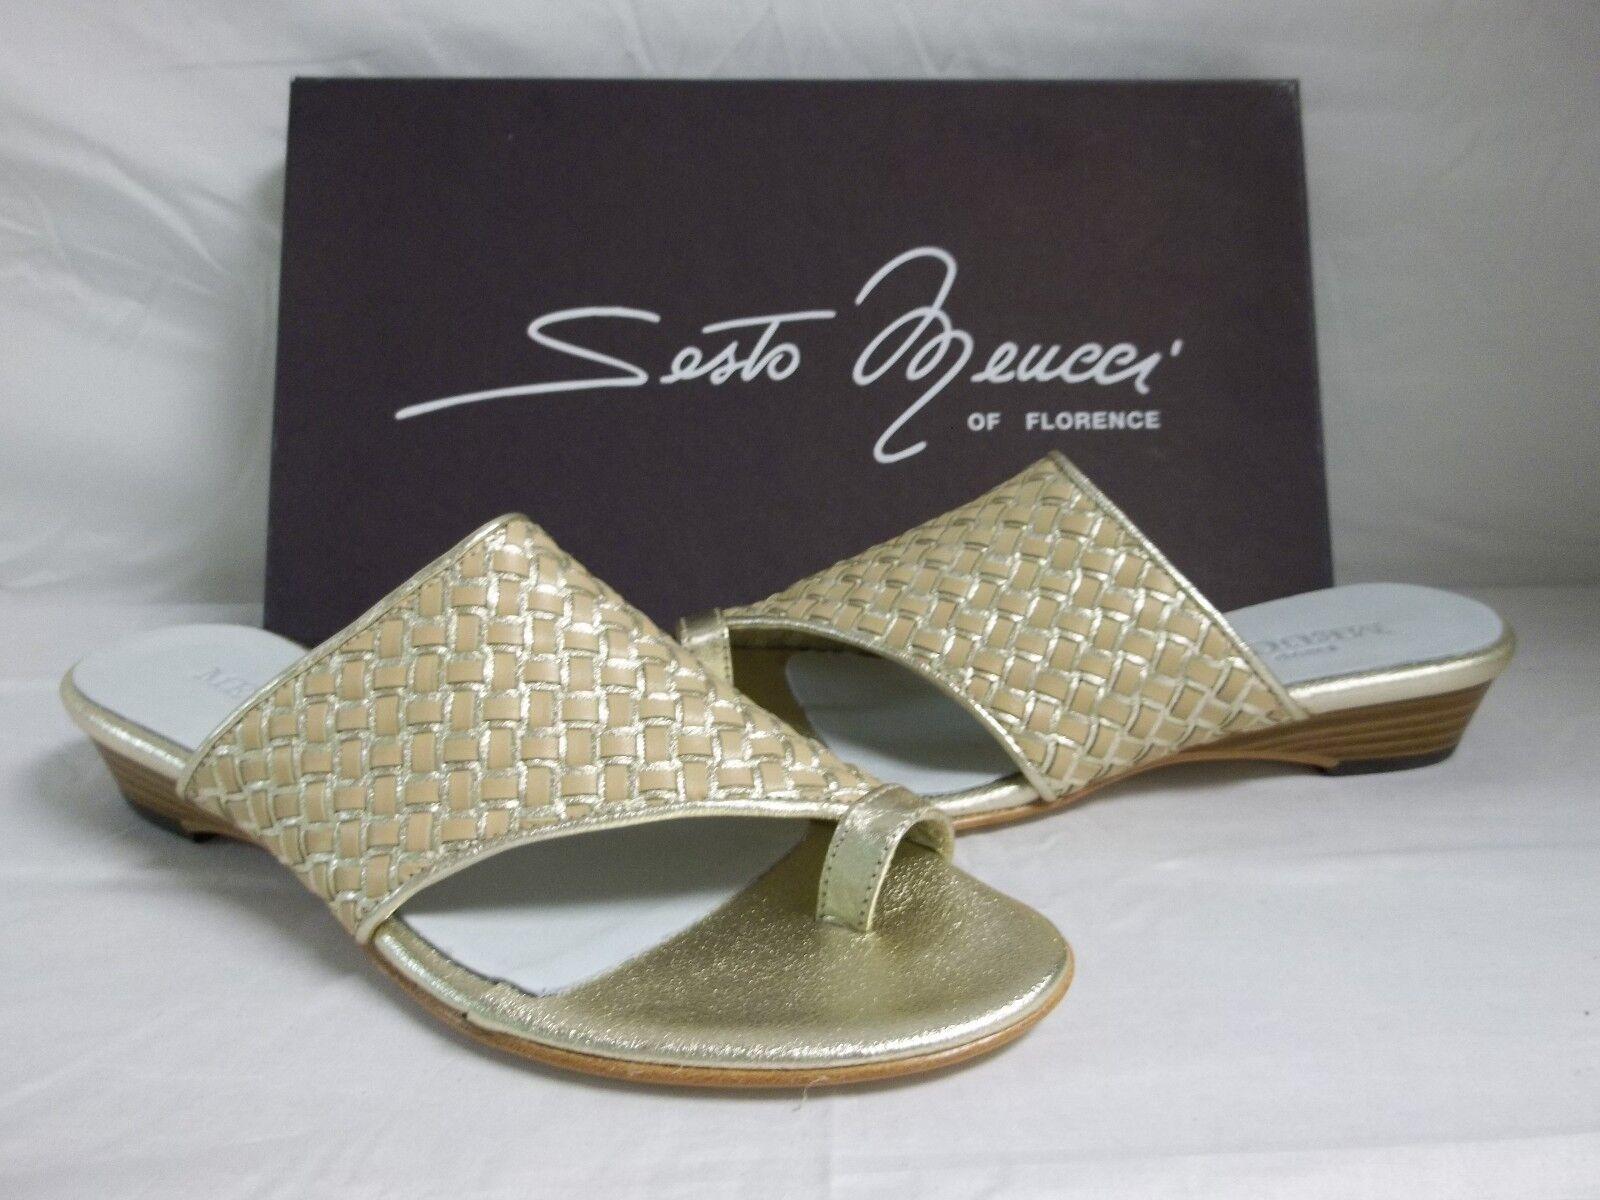 Sesto Meucci Of Florence Sz 6.5 M Geva Platino Leder Sandales NEU Damenschuhe Schuhes